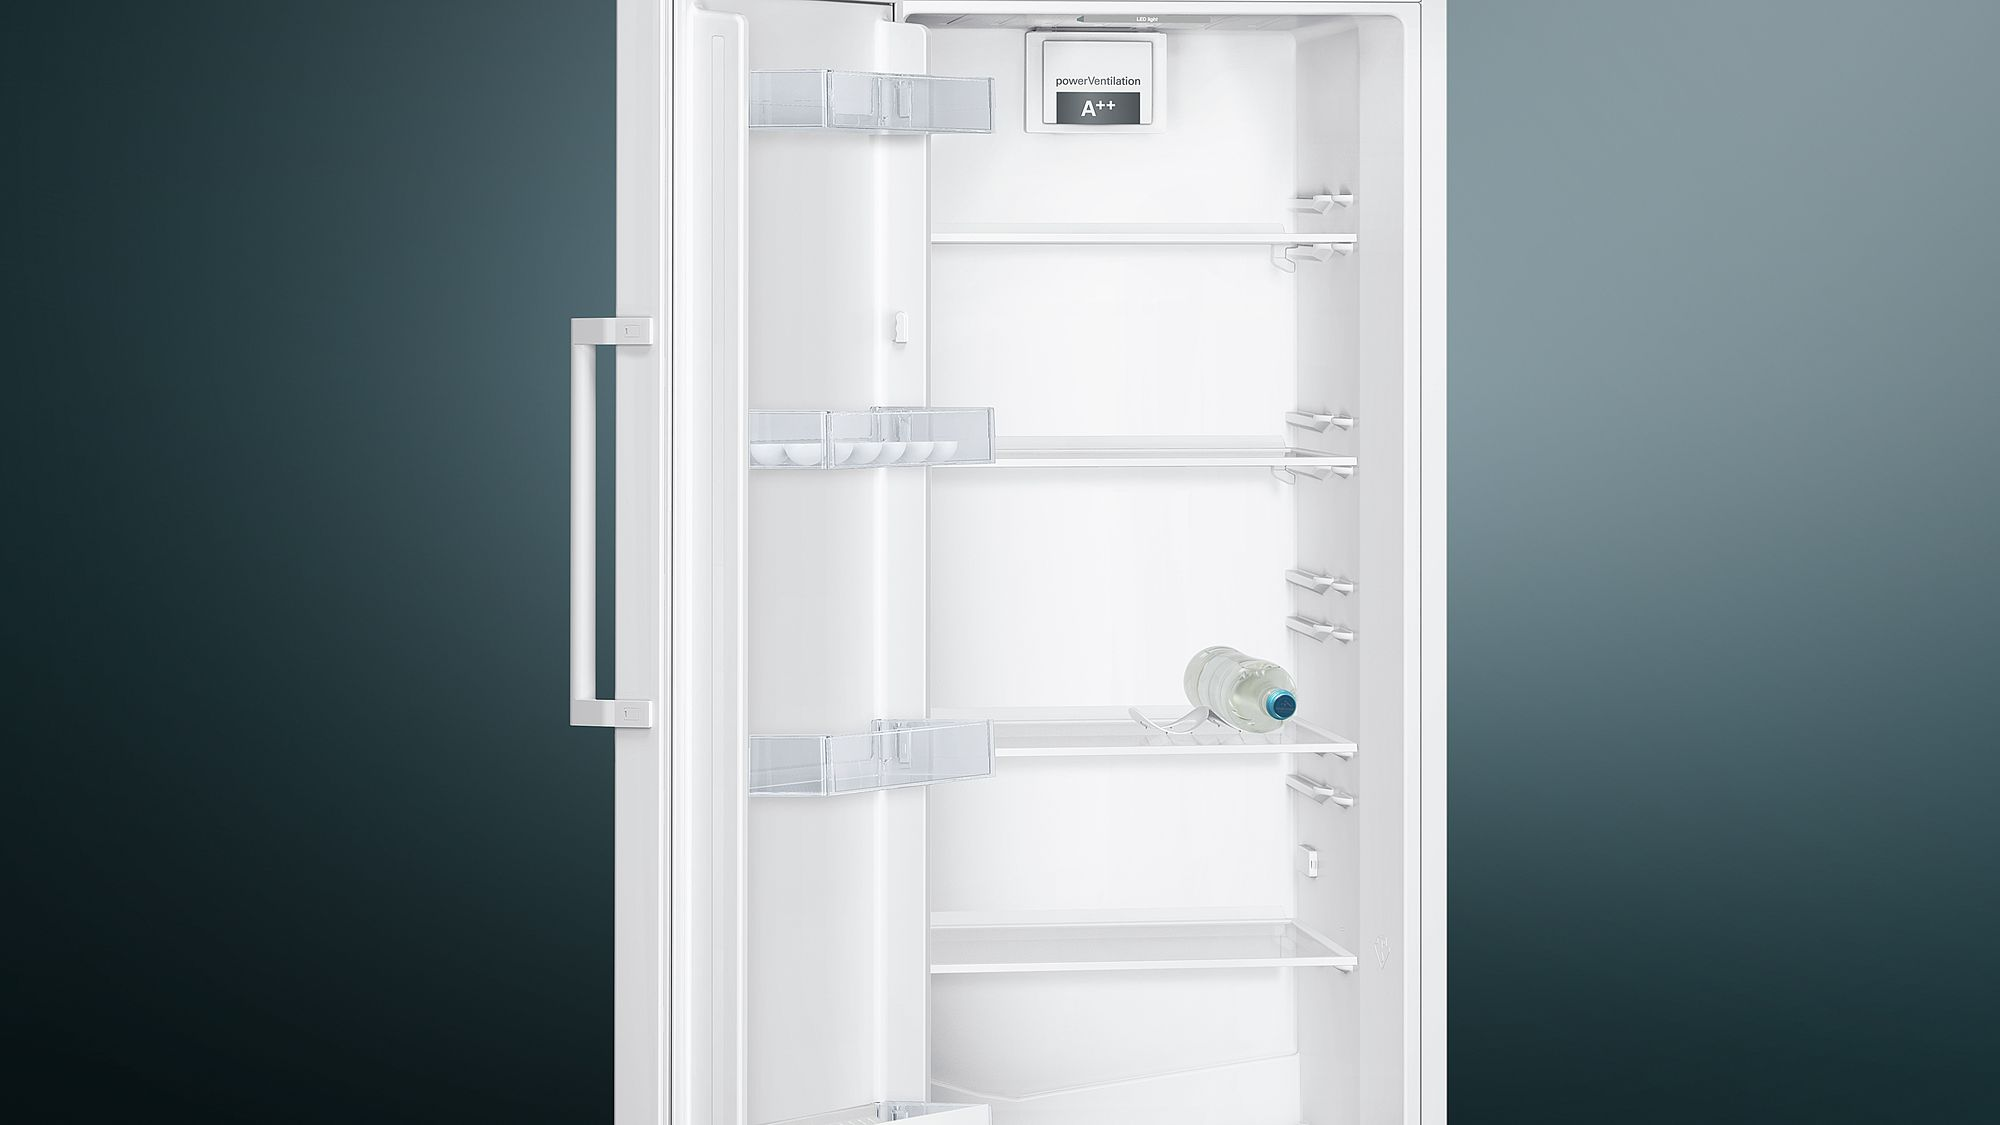 Siemens Kühlschrank Garantie : Siemens kühlschrank weis iq ks vnw p preisflix